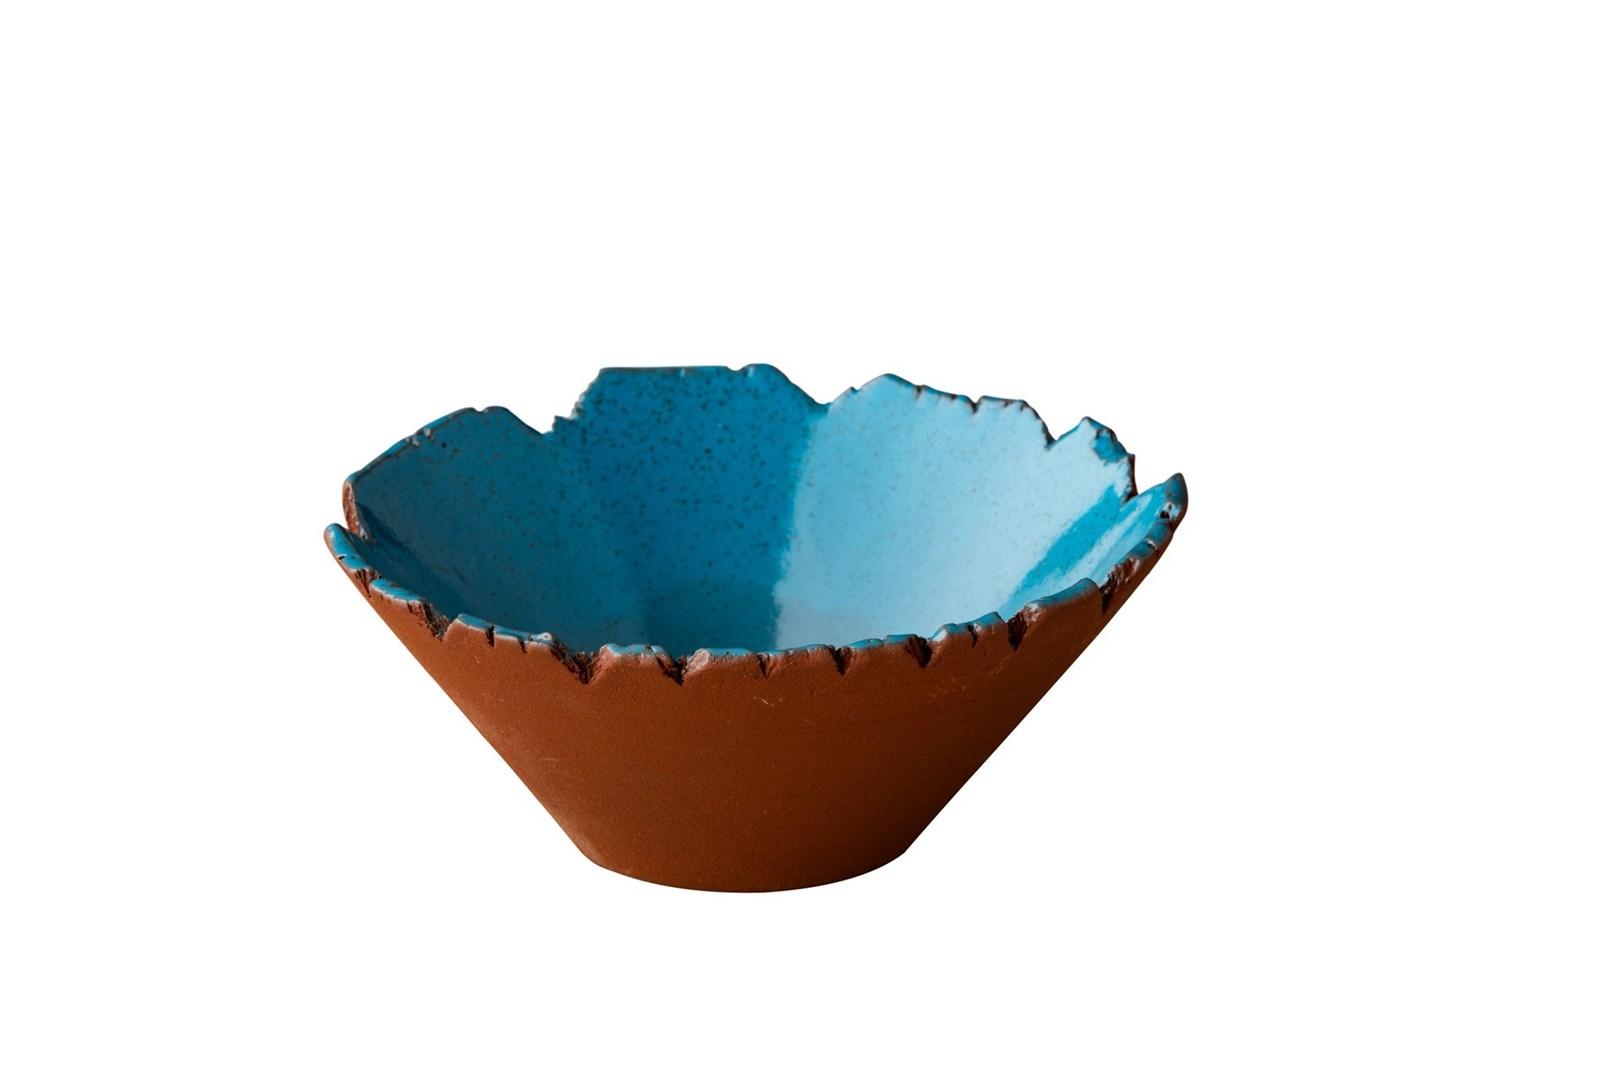 Productafbeelding Stoneheart organische kom  16 x 9,5 cm blauw